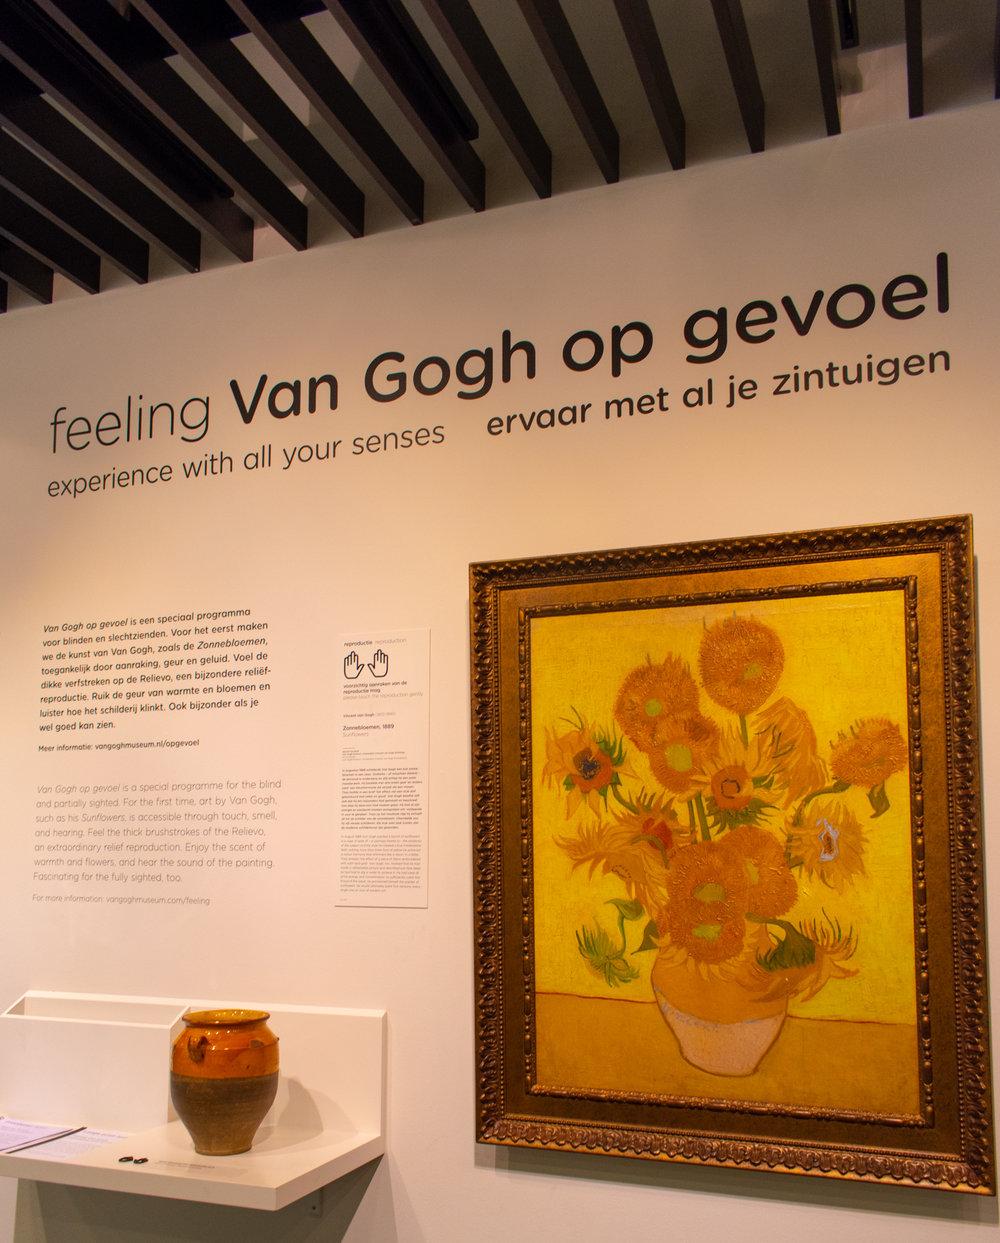 Uprooted-Traveler-Amsterdam-van-gogh-museum-vegan-guide-netherlands.jpg